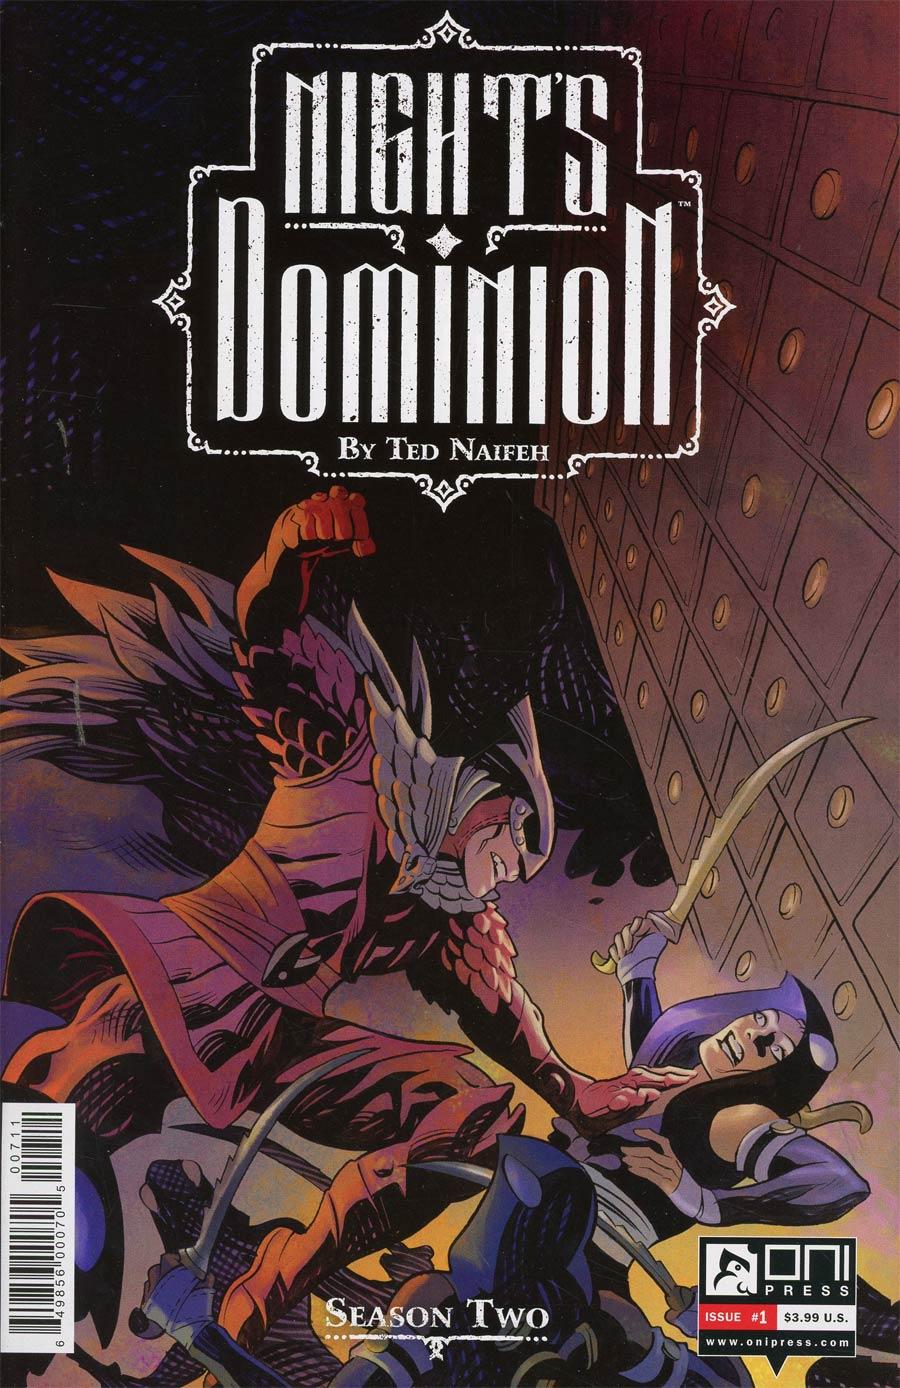 Nights Dominion Season 2 #1